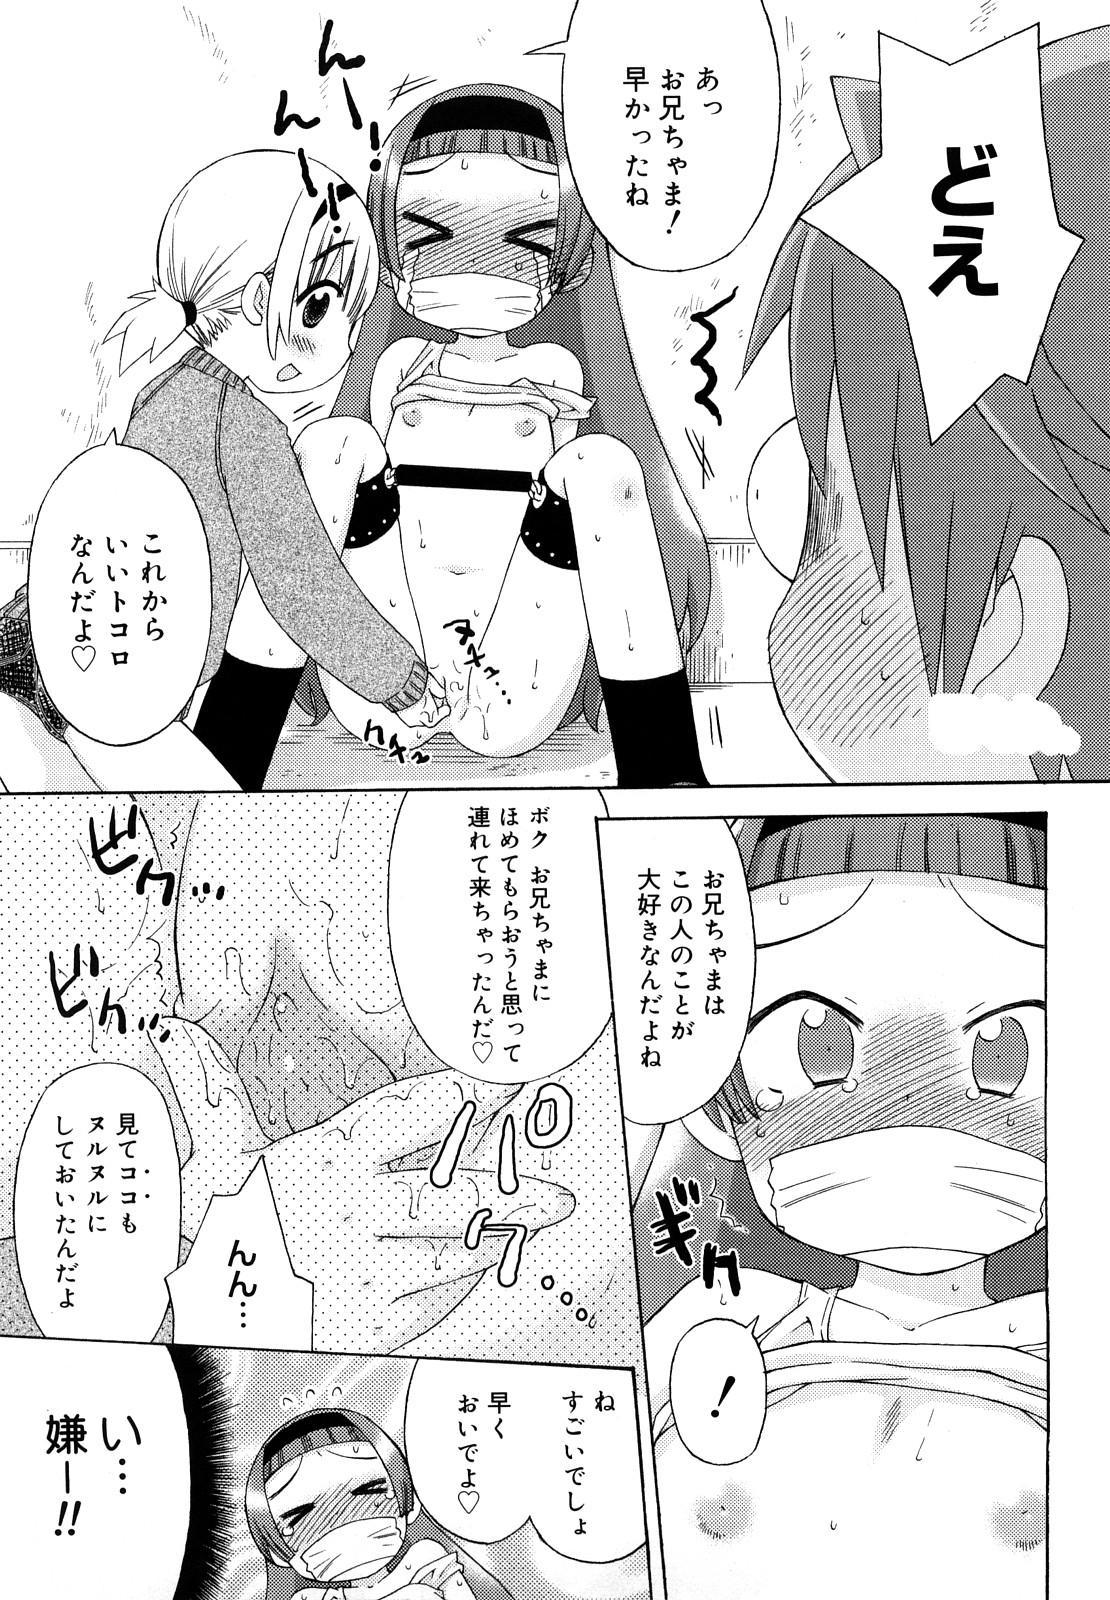 Hatsuden Pandakun! Shinsouban 155